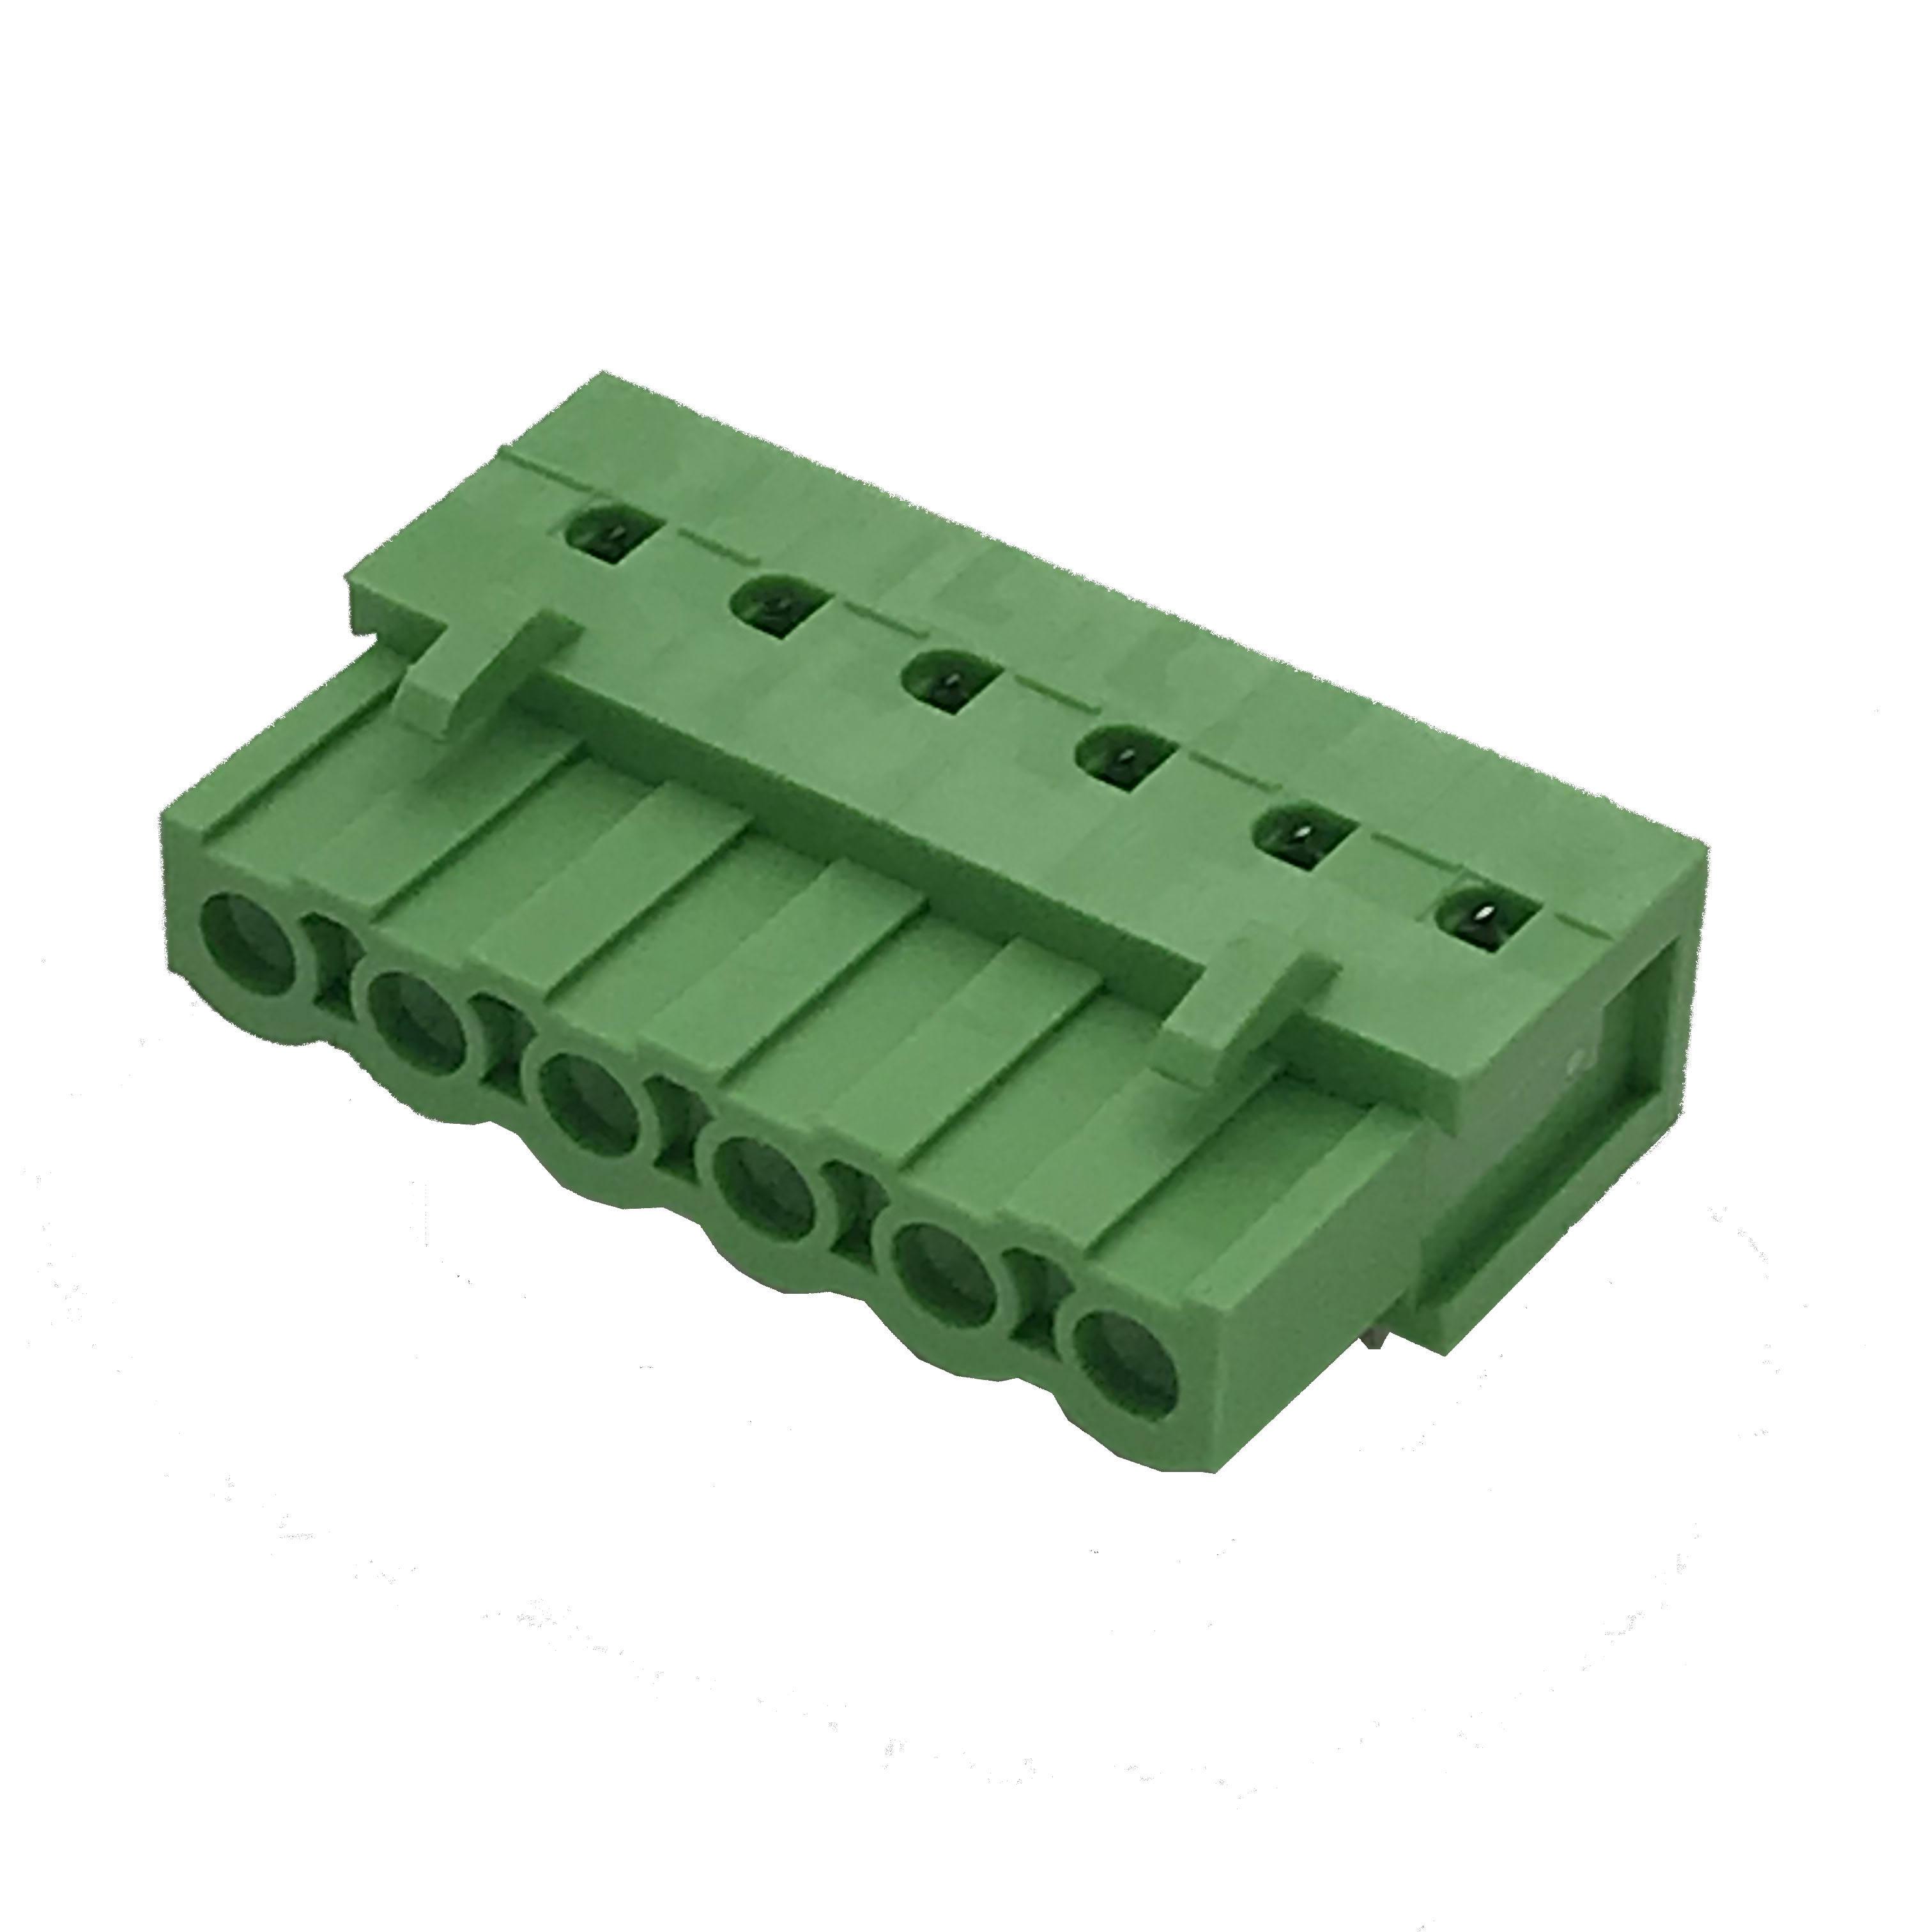 40 Pcs 3 Pin 5.08mm Pitch PCB Mount Screw Terminal Block AC 300V 10A MJ